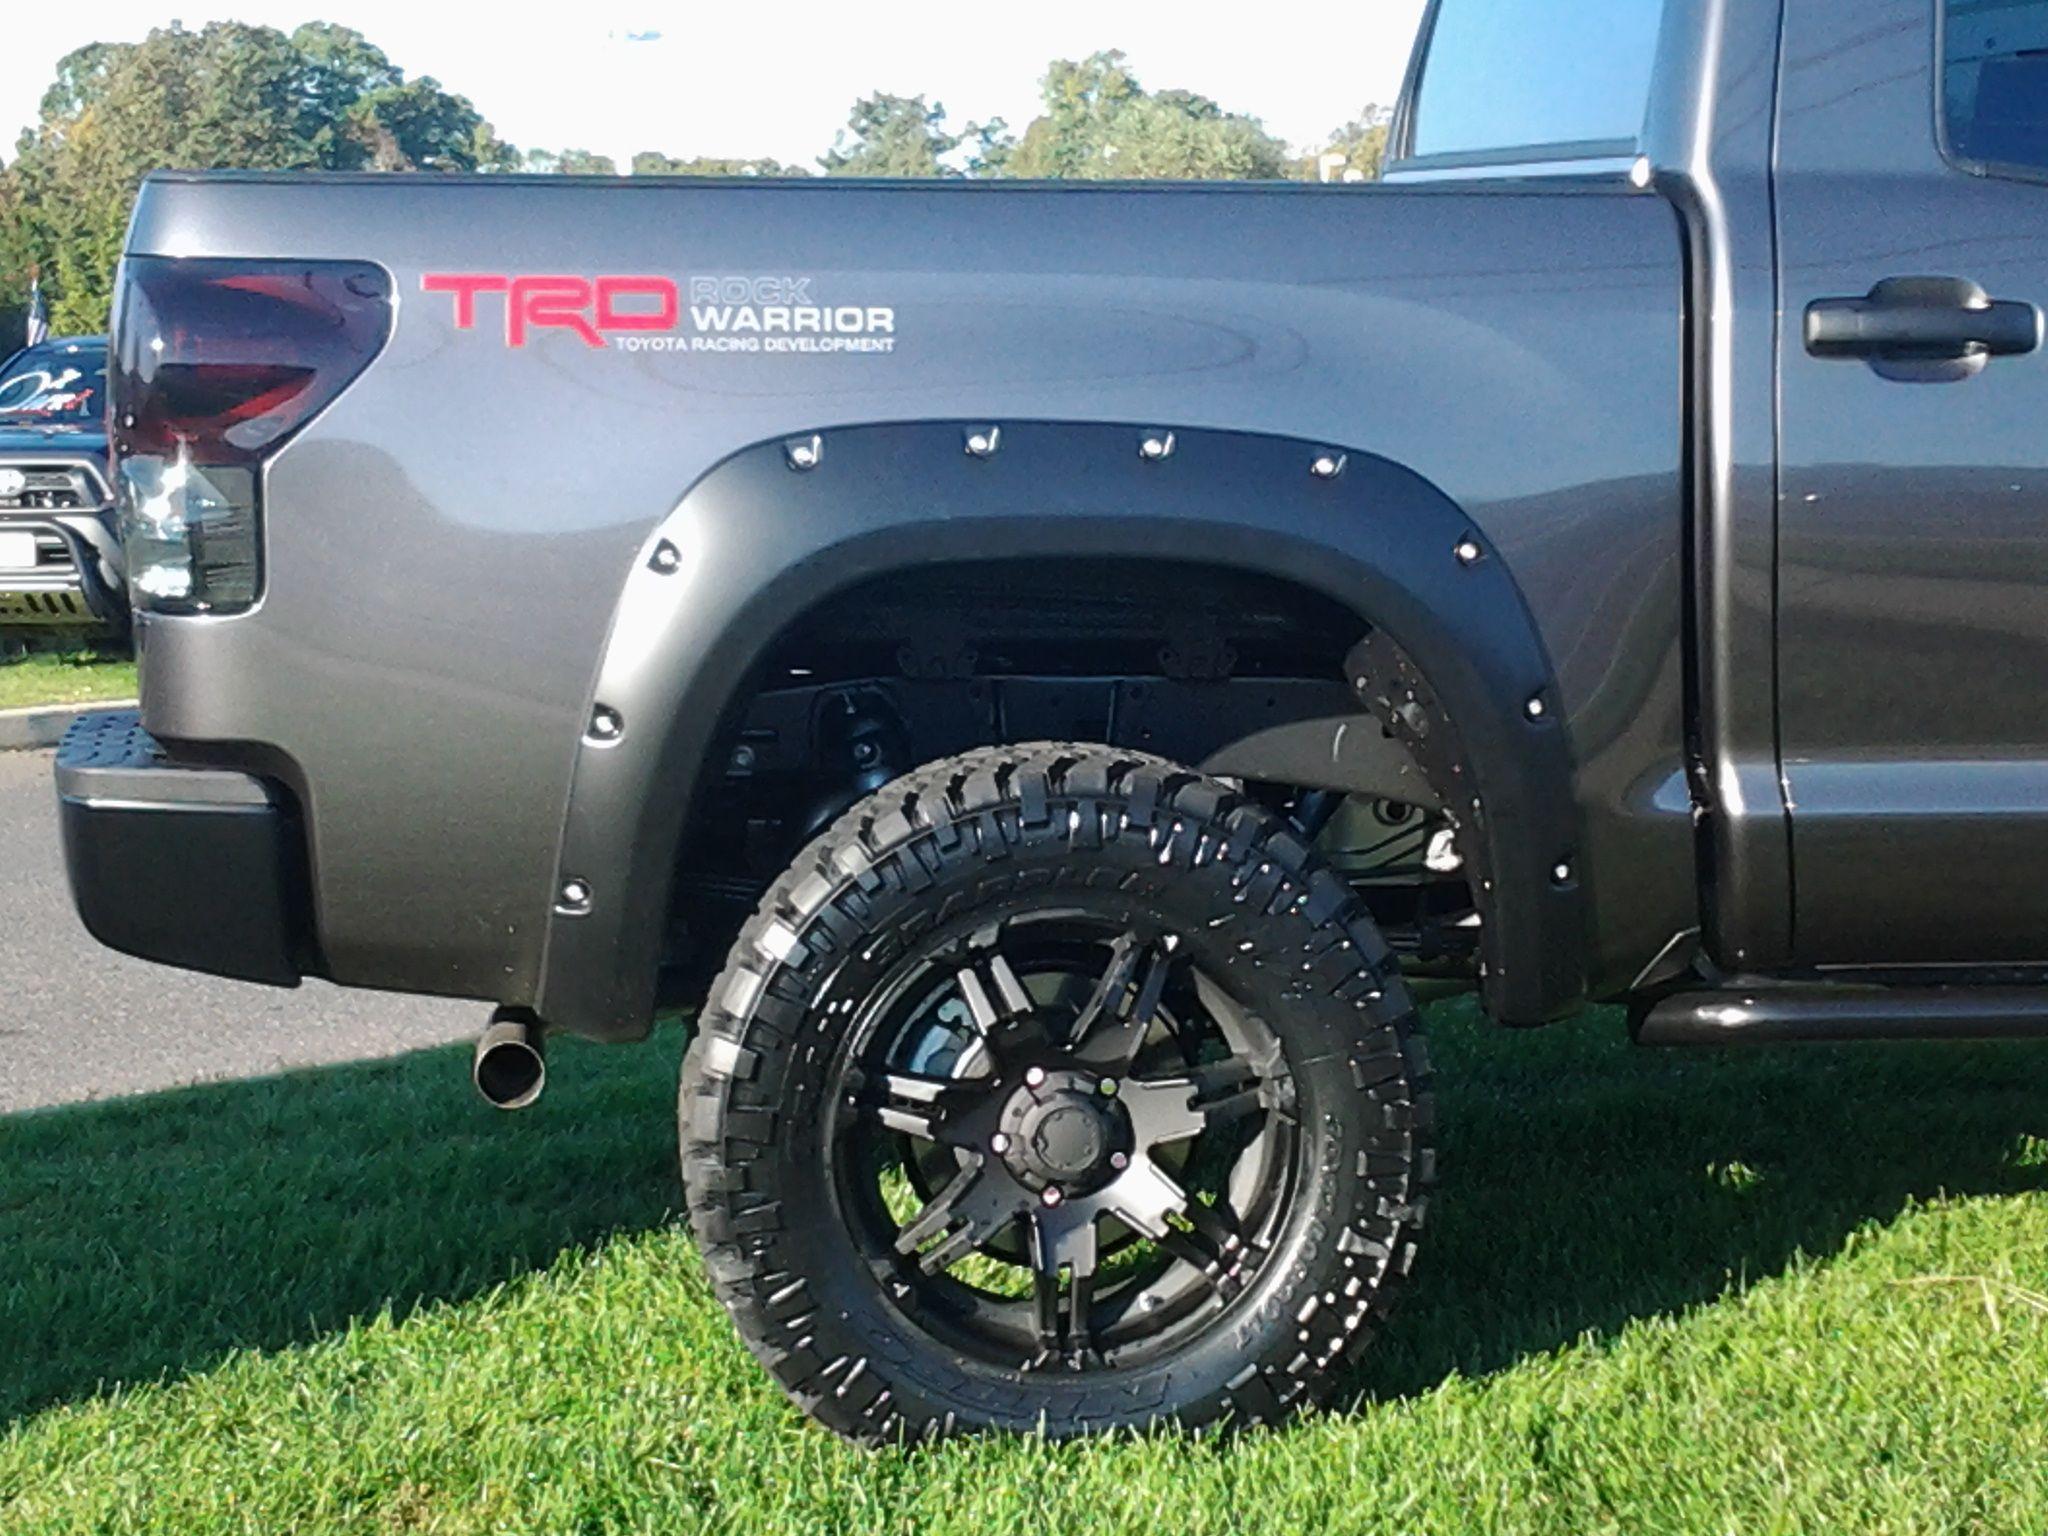 Tro rock warrior toyota racing development truck tires go big or go home